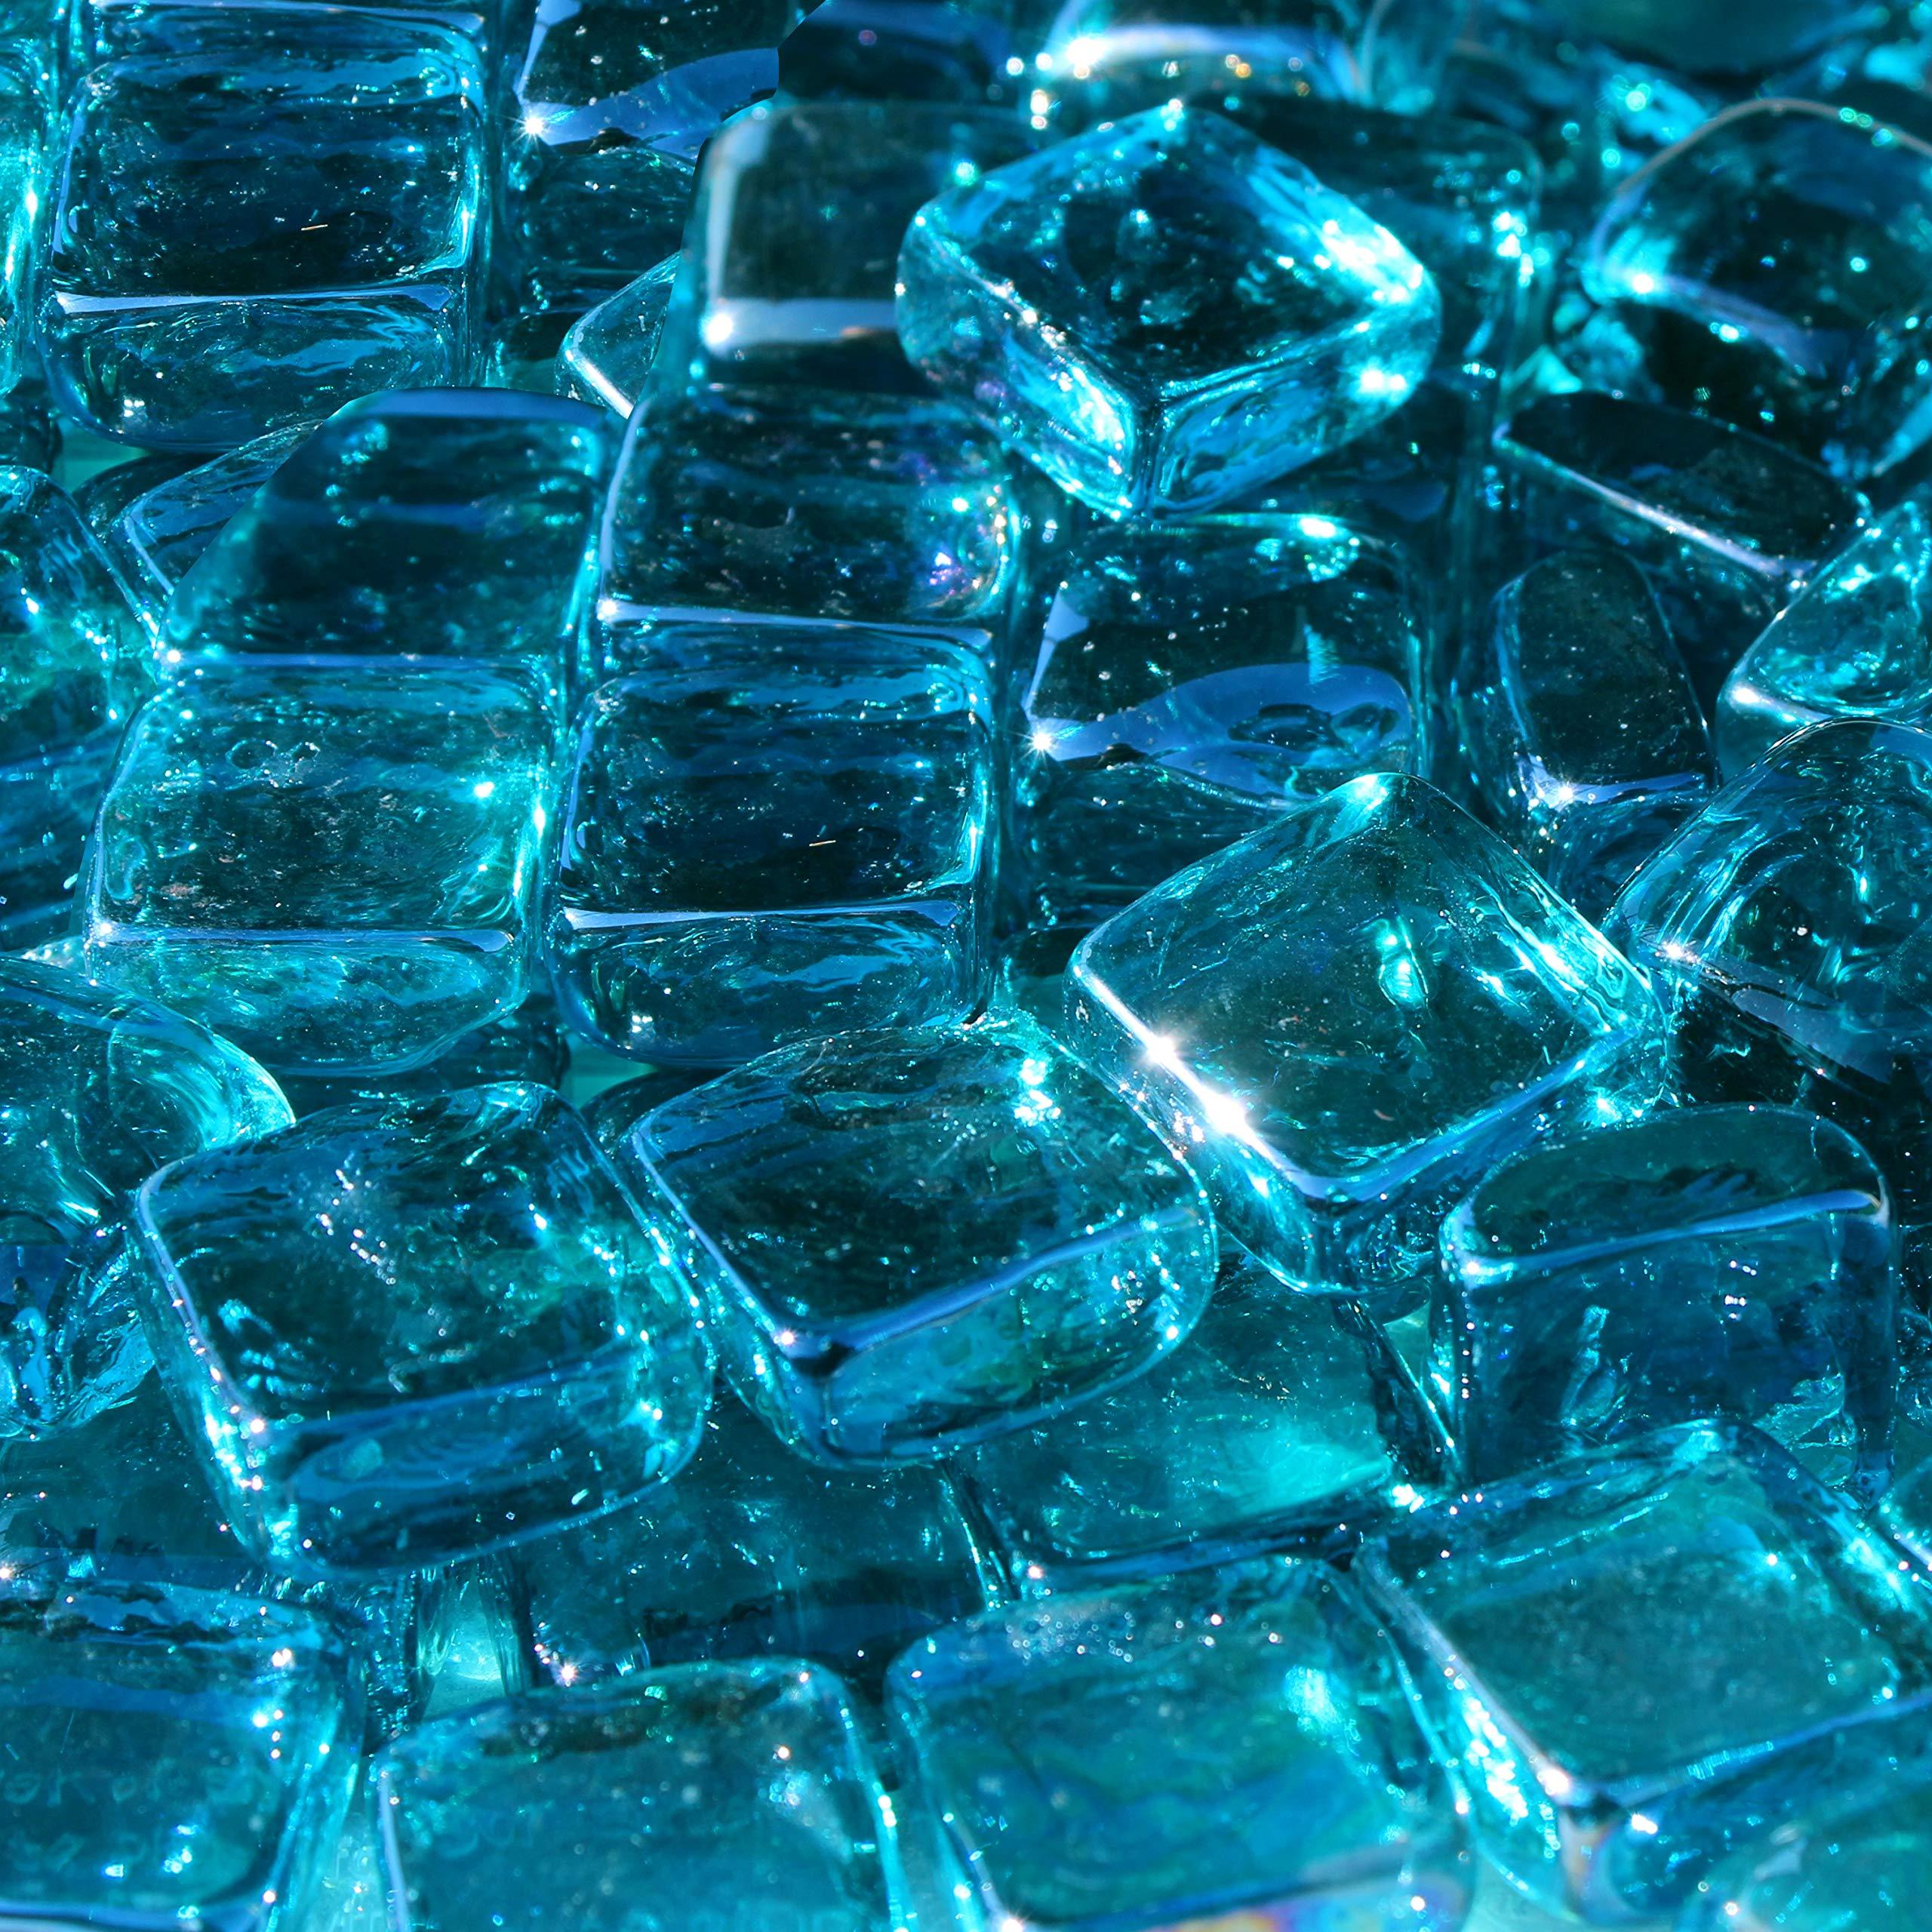 Blue Ridge Brand&Trade; Aqua Reflective Fire Glass Cubes - 20-Pound Professional Grade Fire Pit Glass - 3/4'' Reflective Glass for Fire Pit and Landscaping